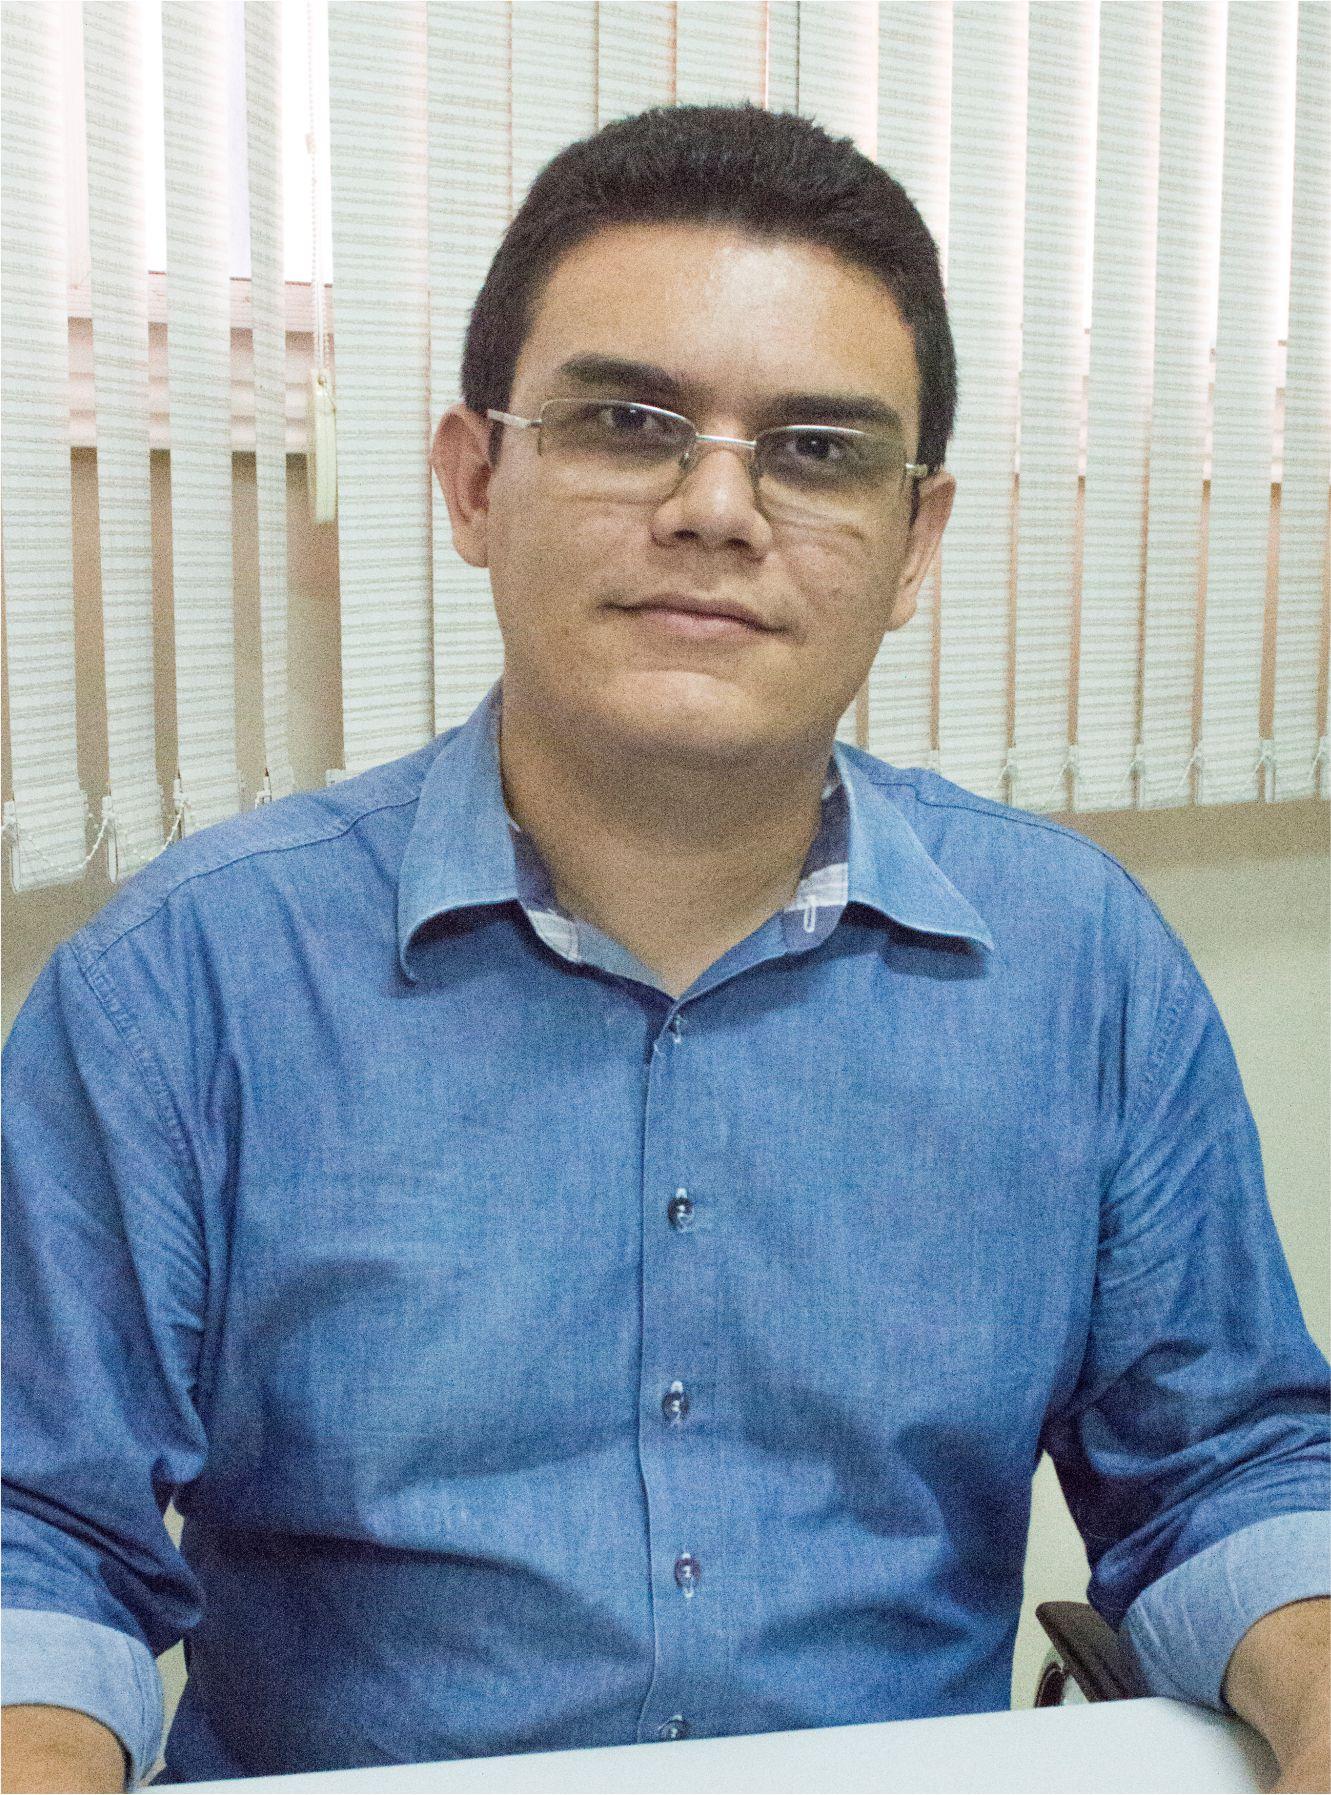 Humberto Duarte Monte Júnior